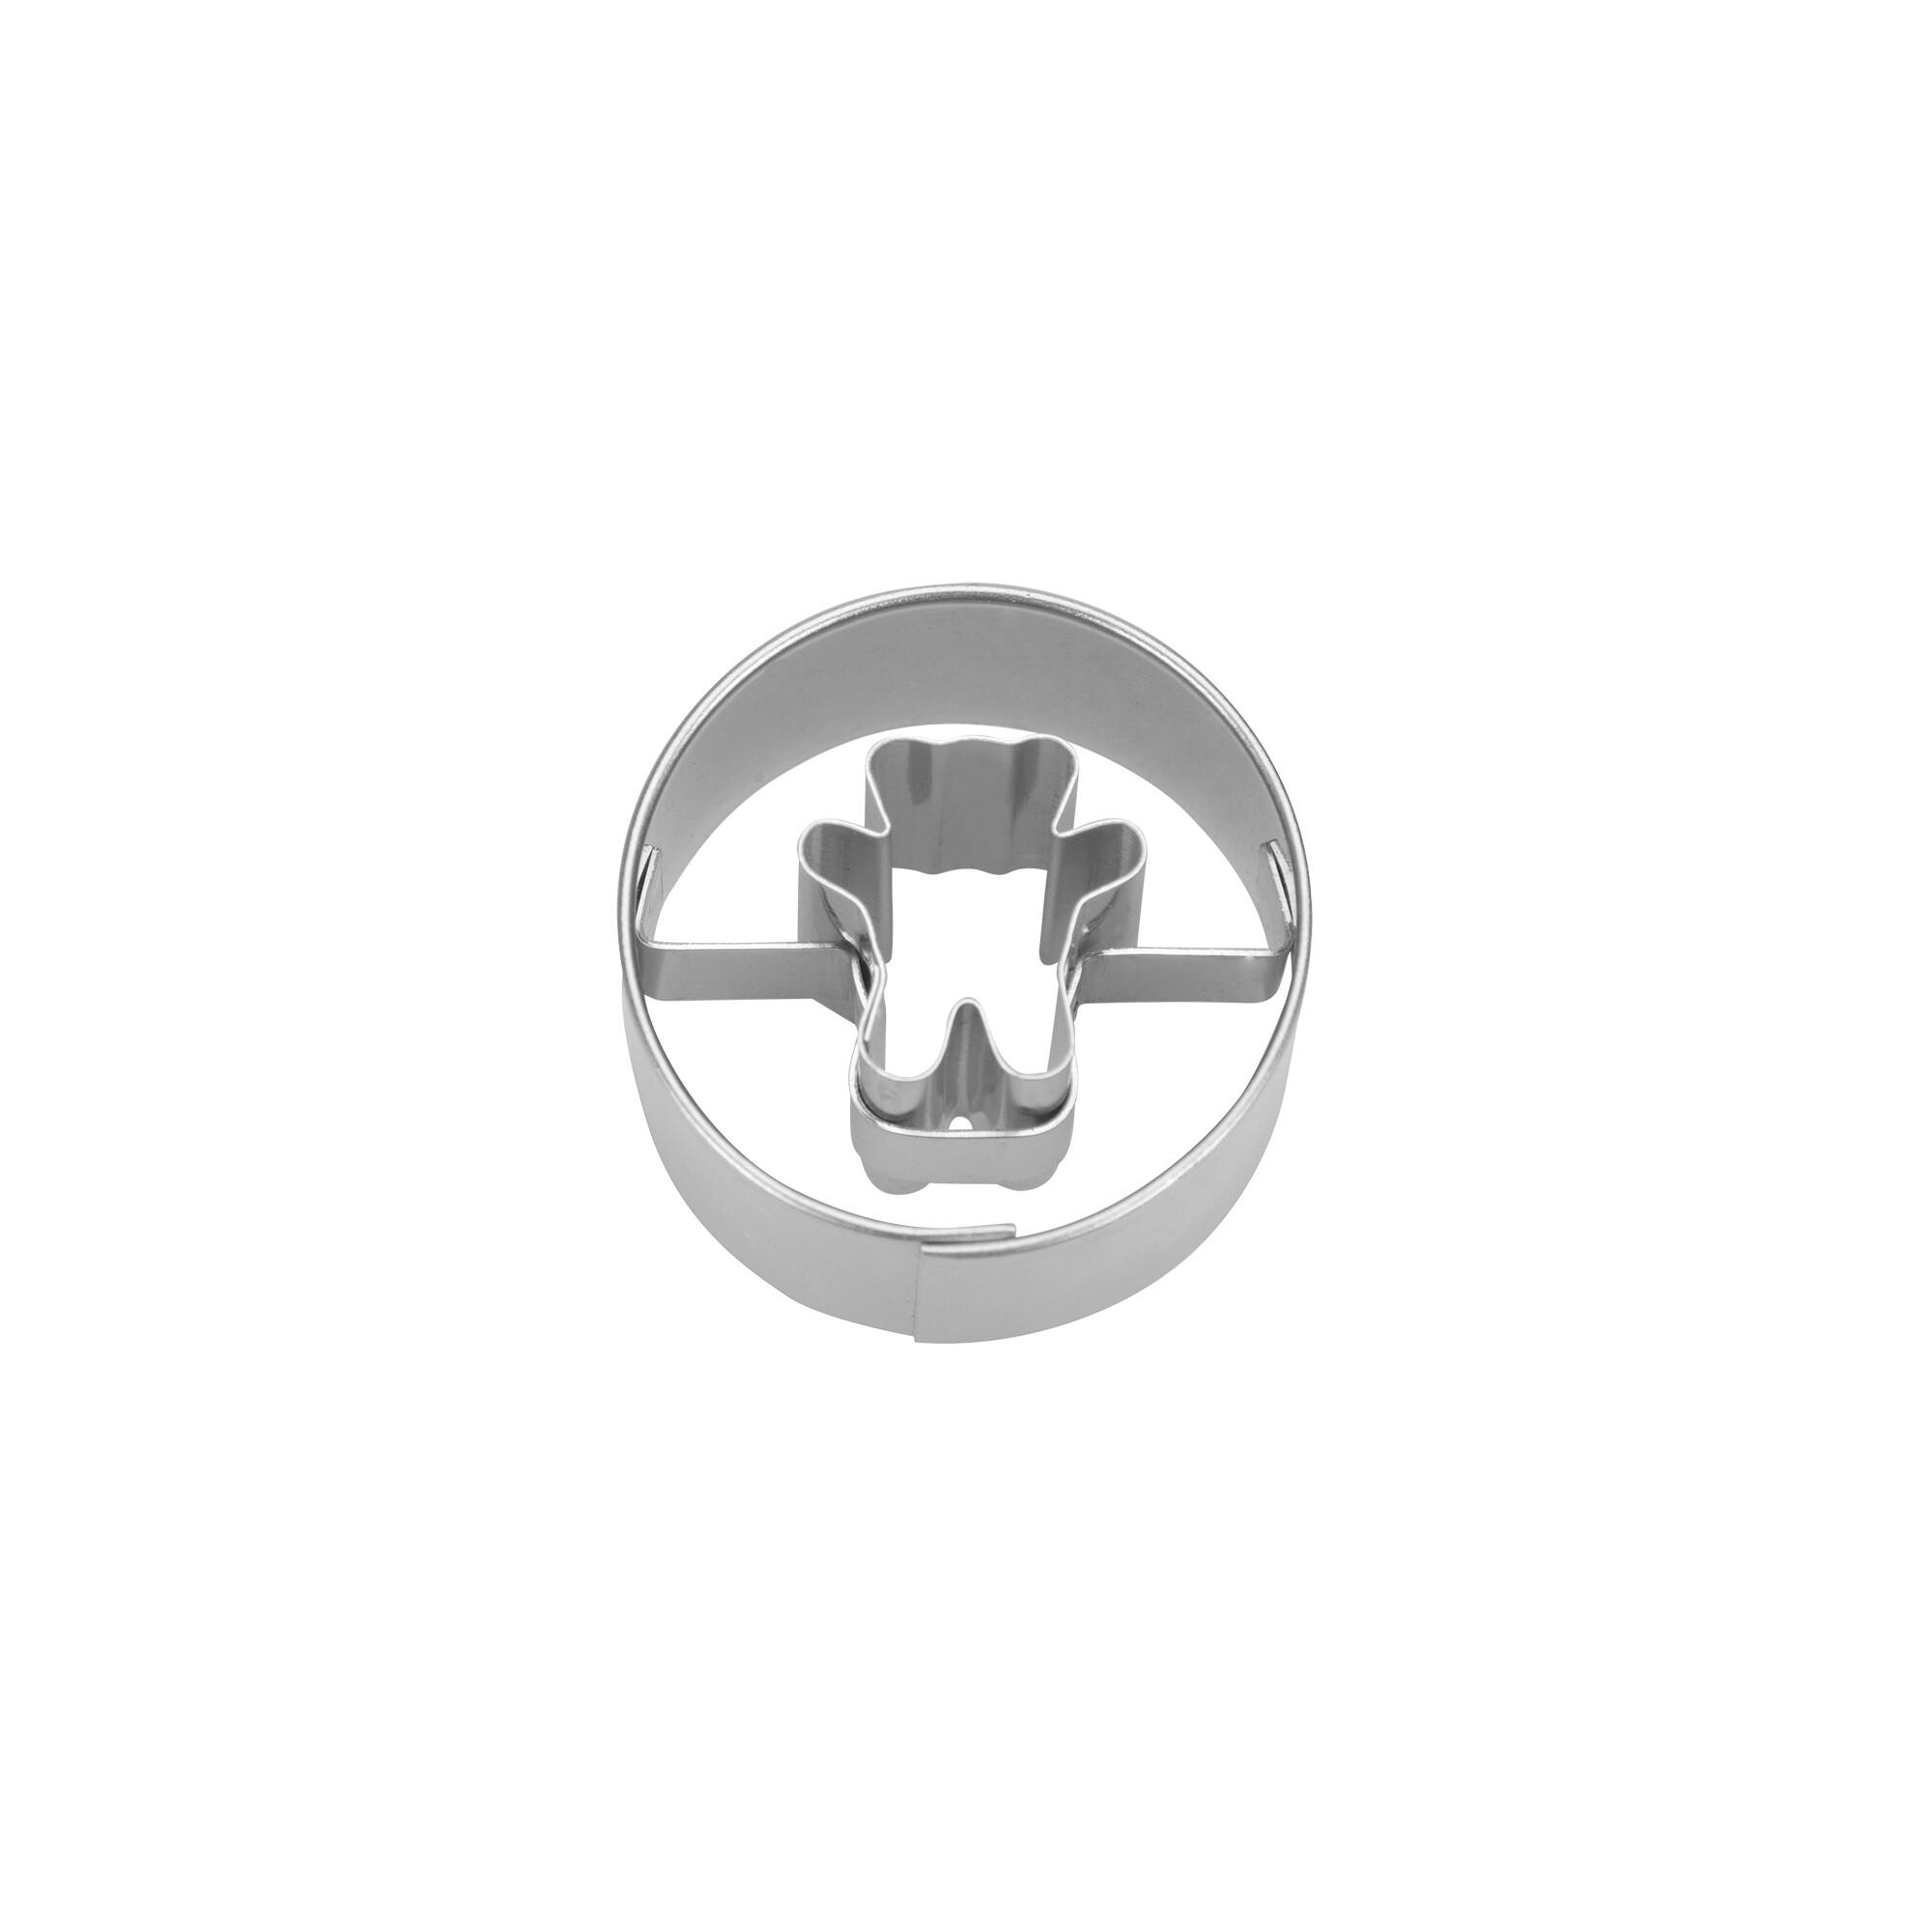 Ausstecher - Bär in Ring - Mini